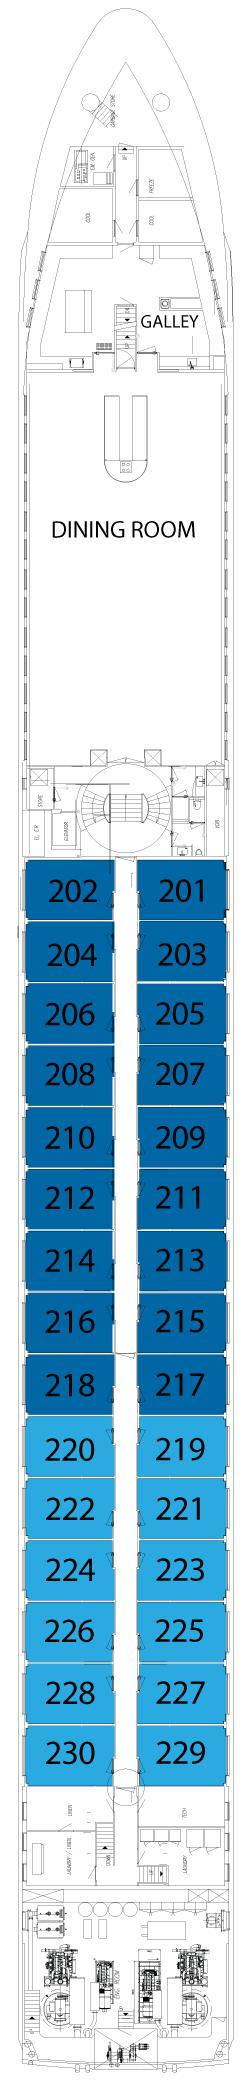 Avalon Luminary Sapphire Deck